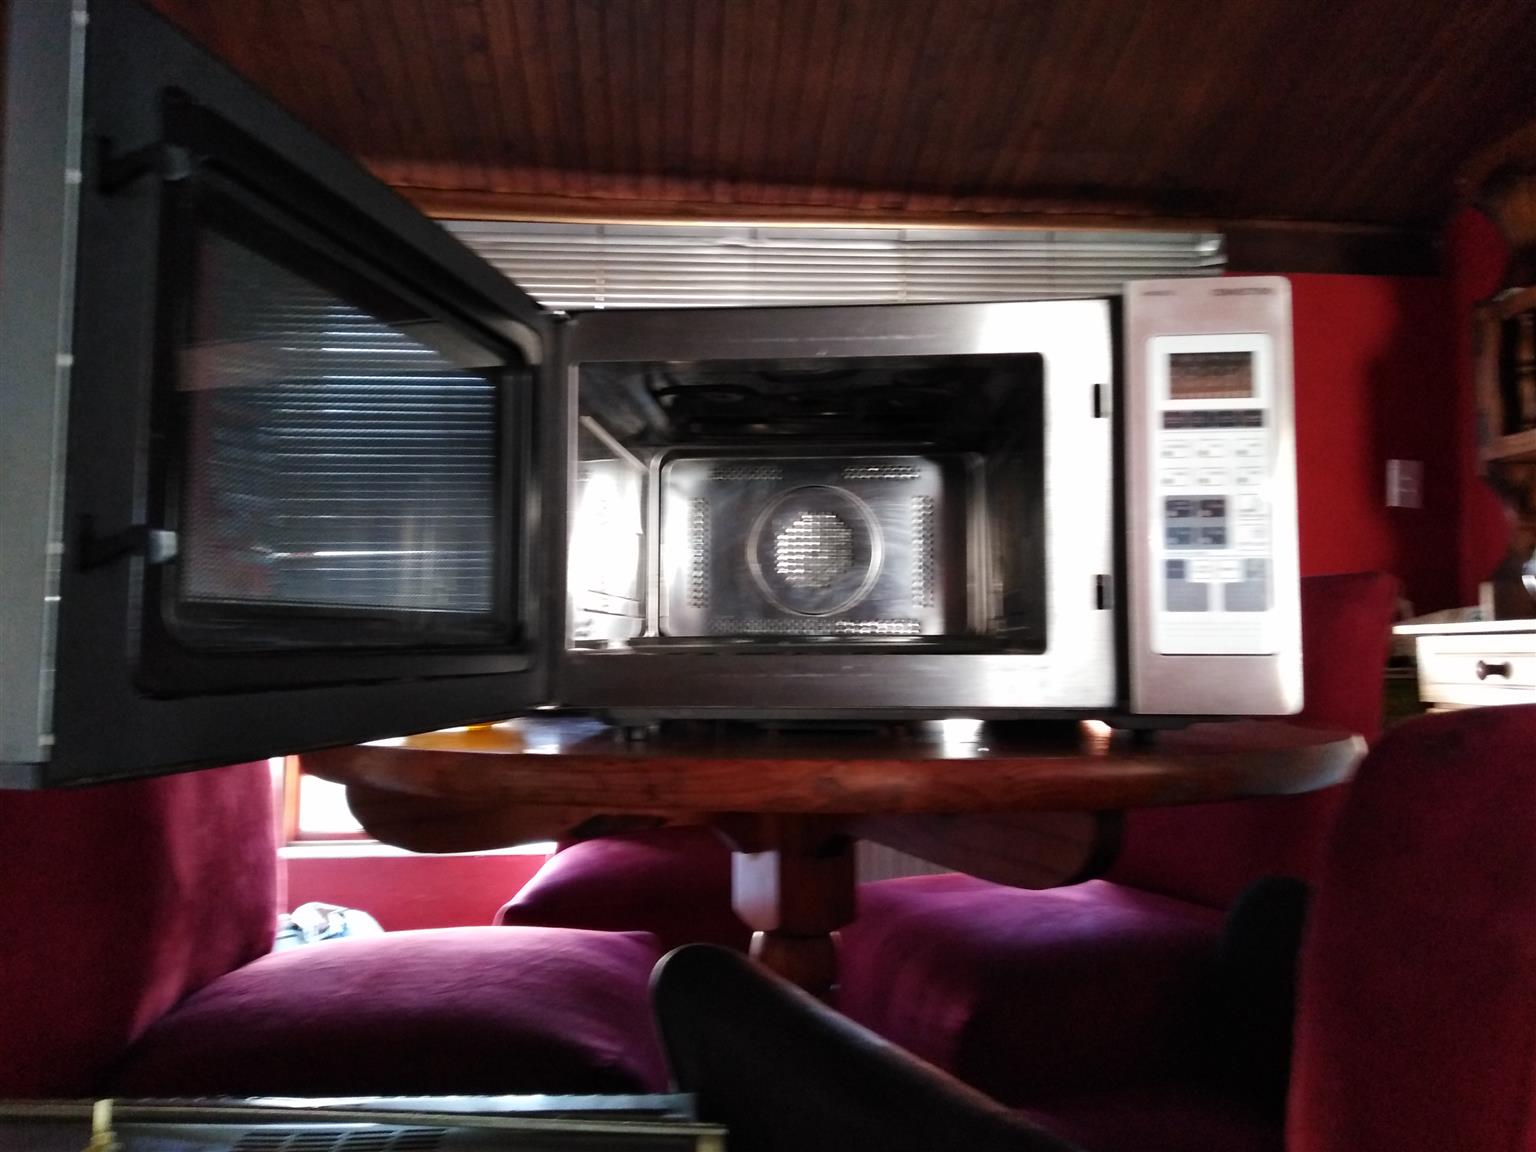 Whirlpool oven & Kelvinator Convection Microwave